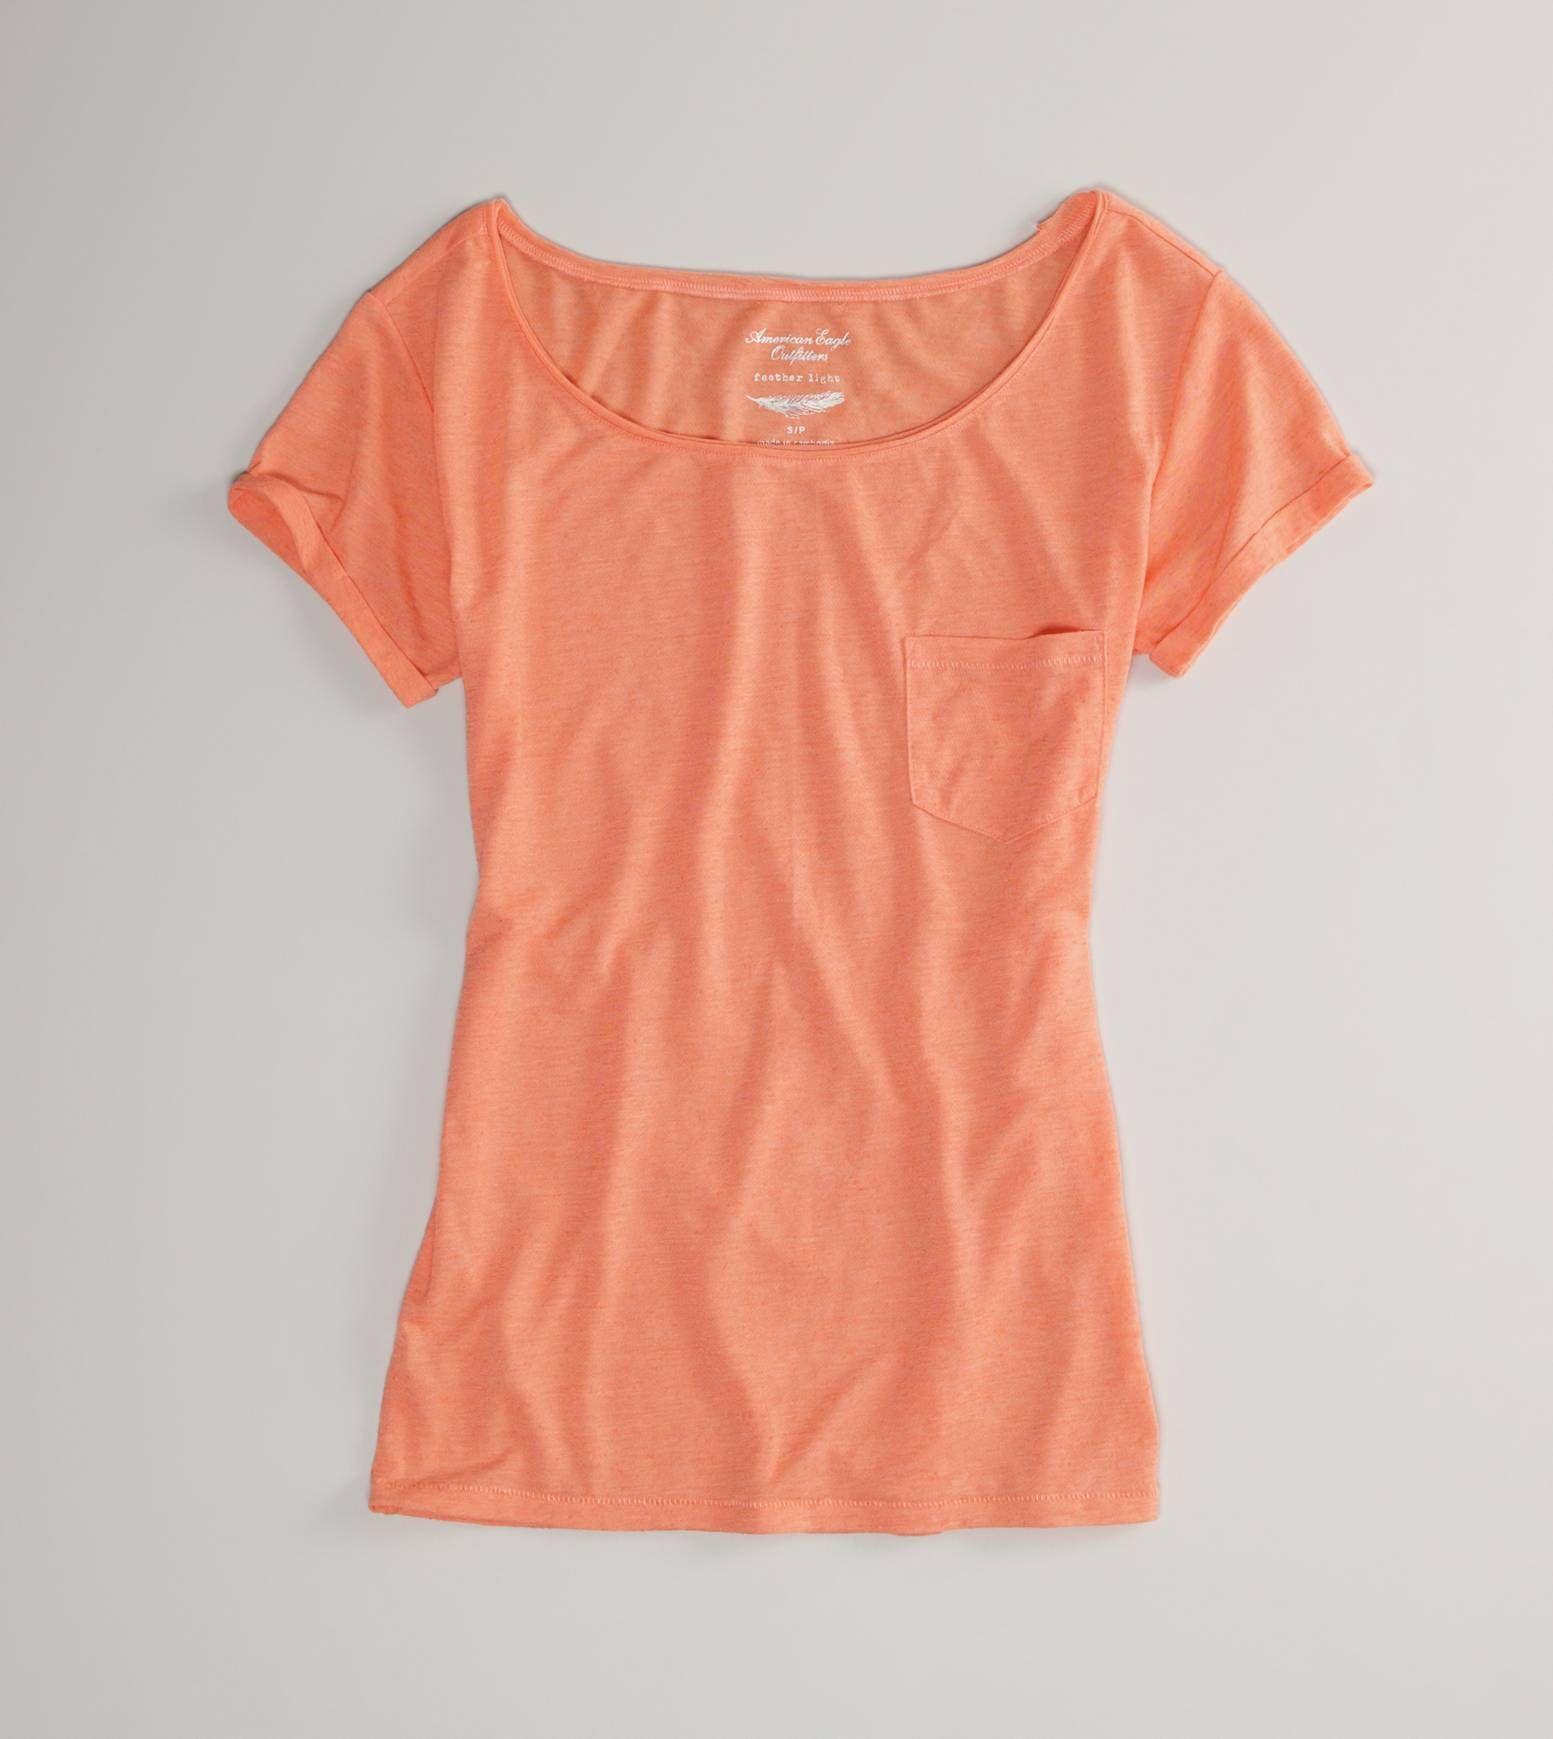 orange t-shirt.